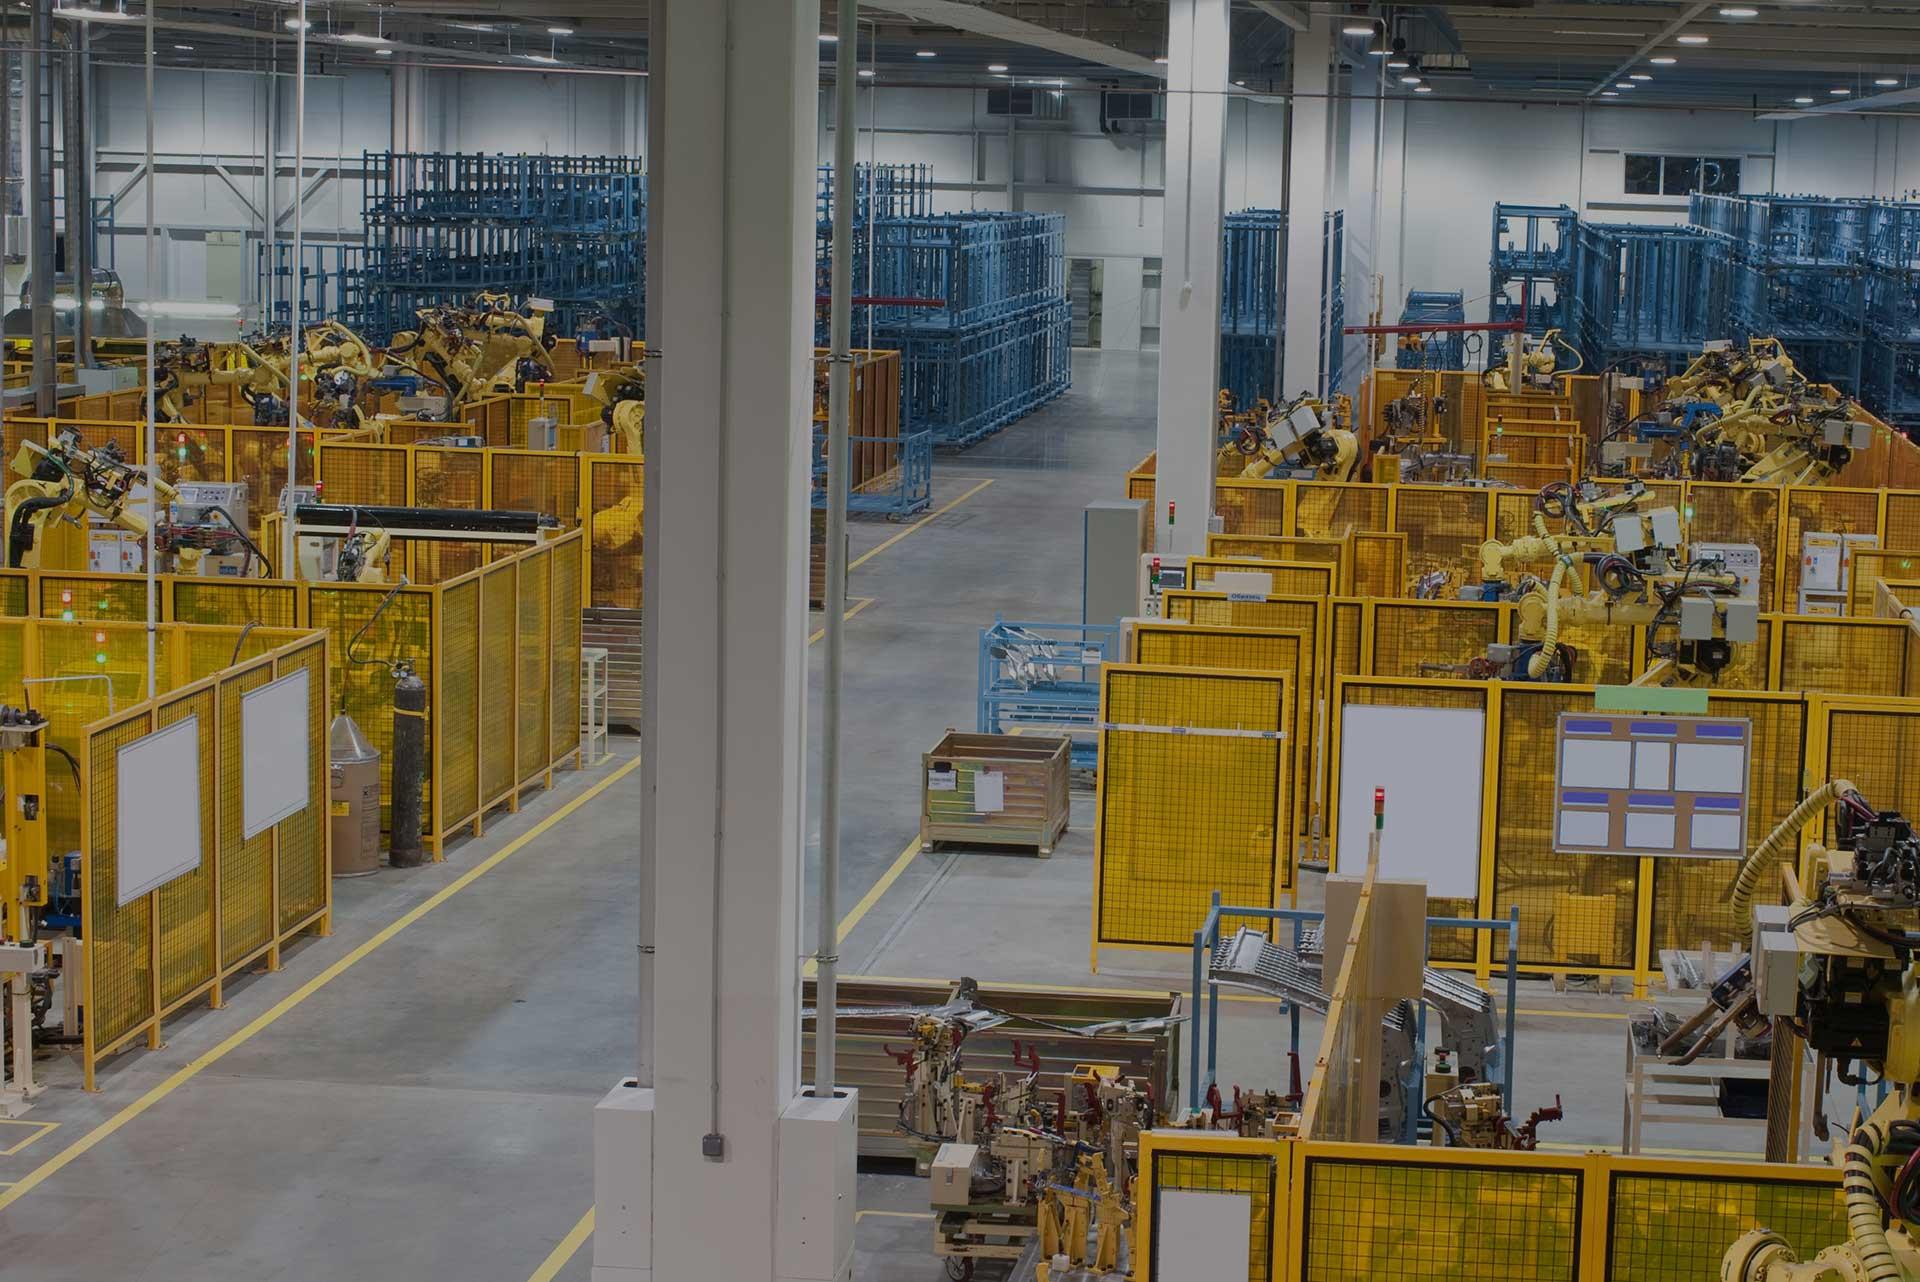 yellow warehouse with machines